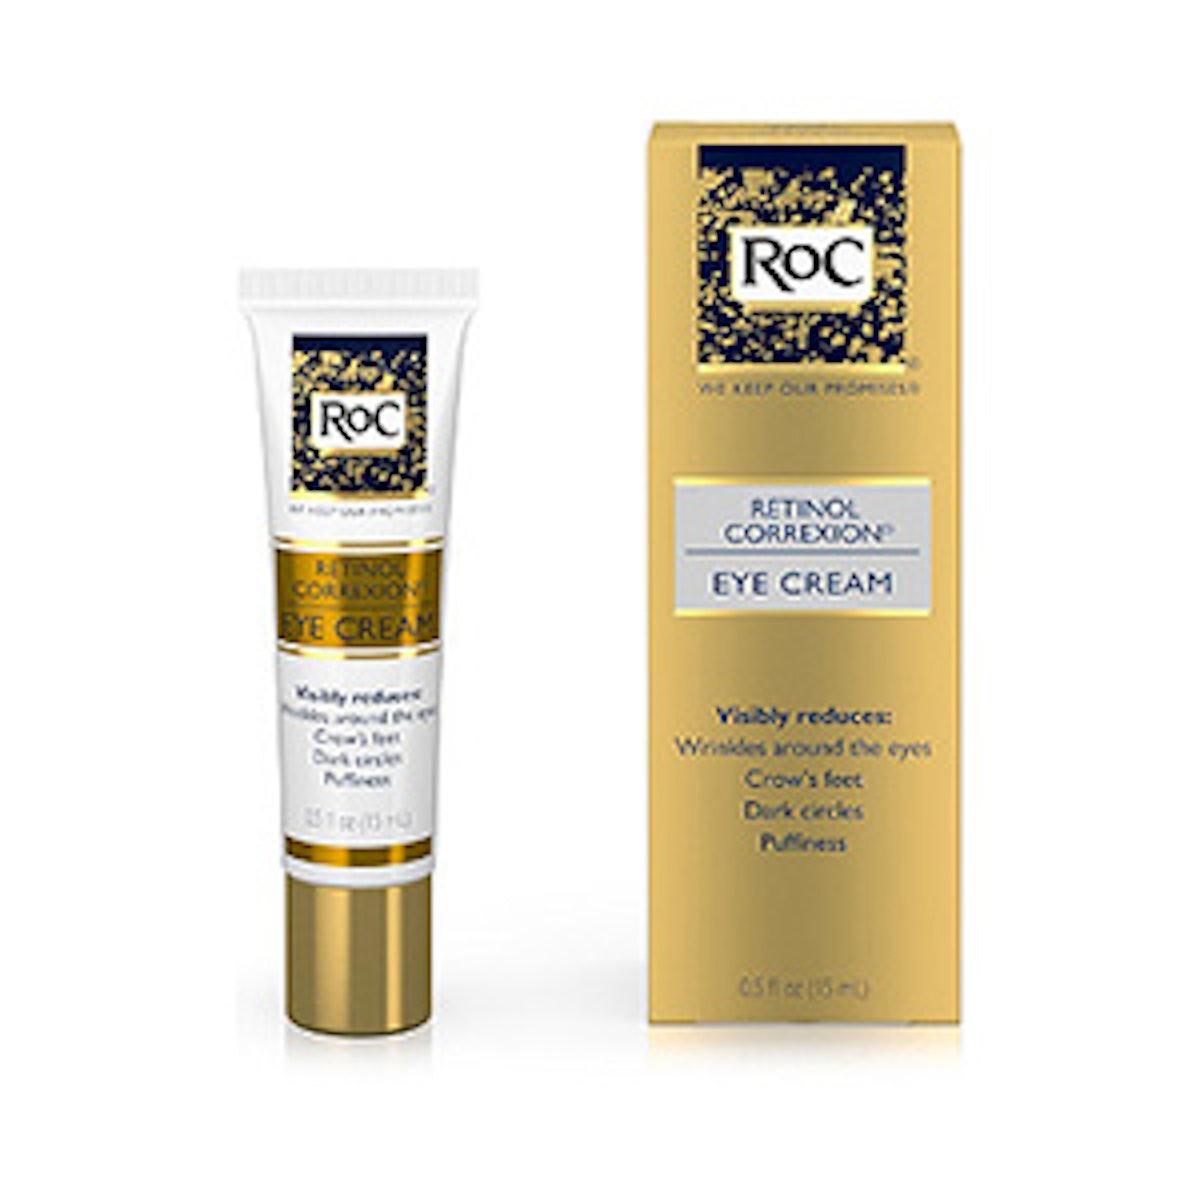 RoC Retinol Correxion Eye Cream